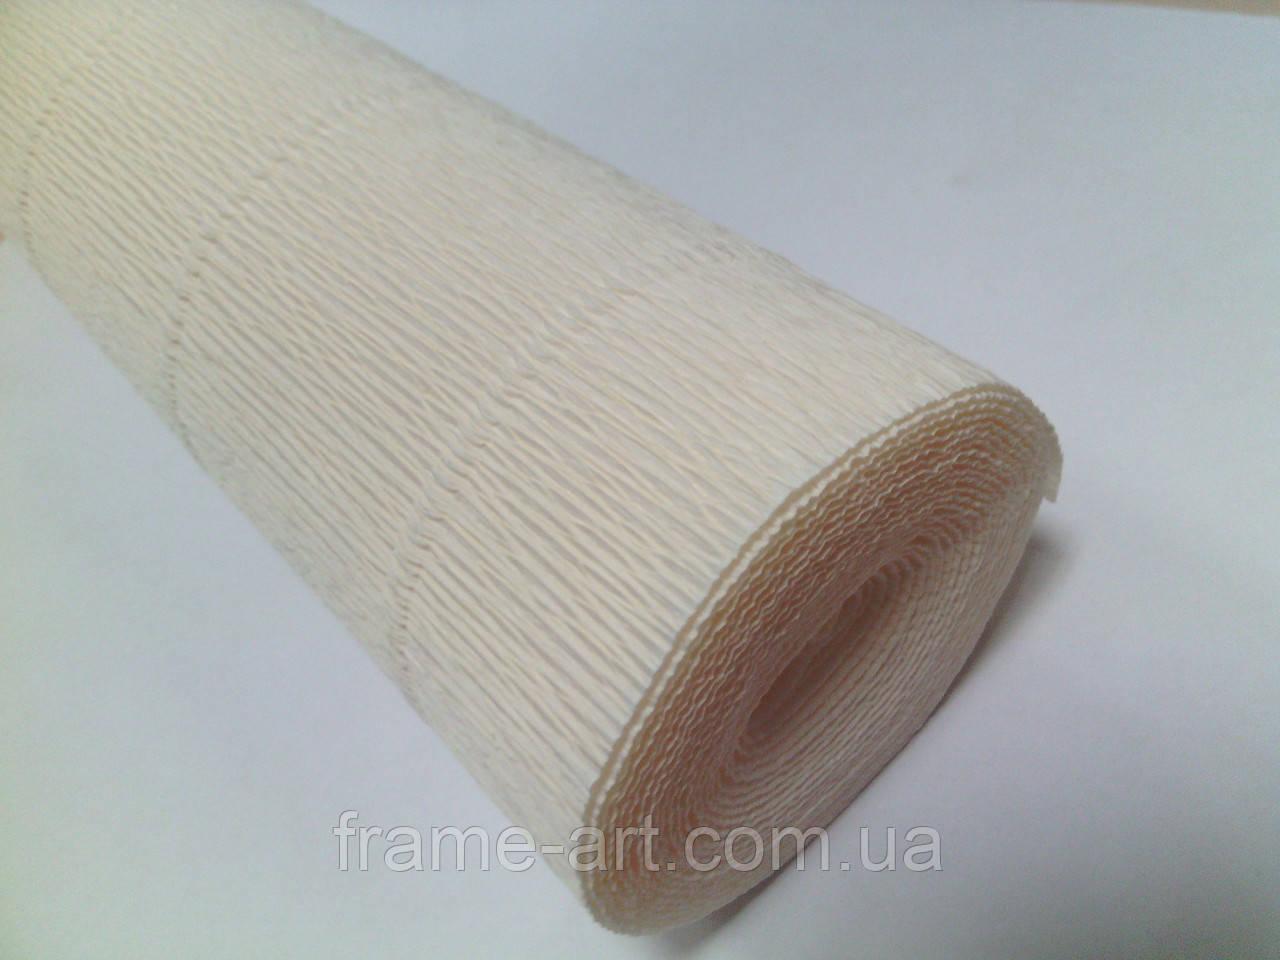 Креп-бумага Италия 50см*2,5м 180г/м2 603 молочка 074